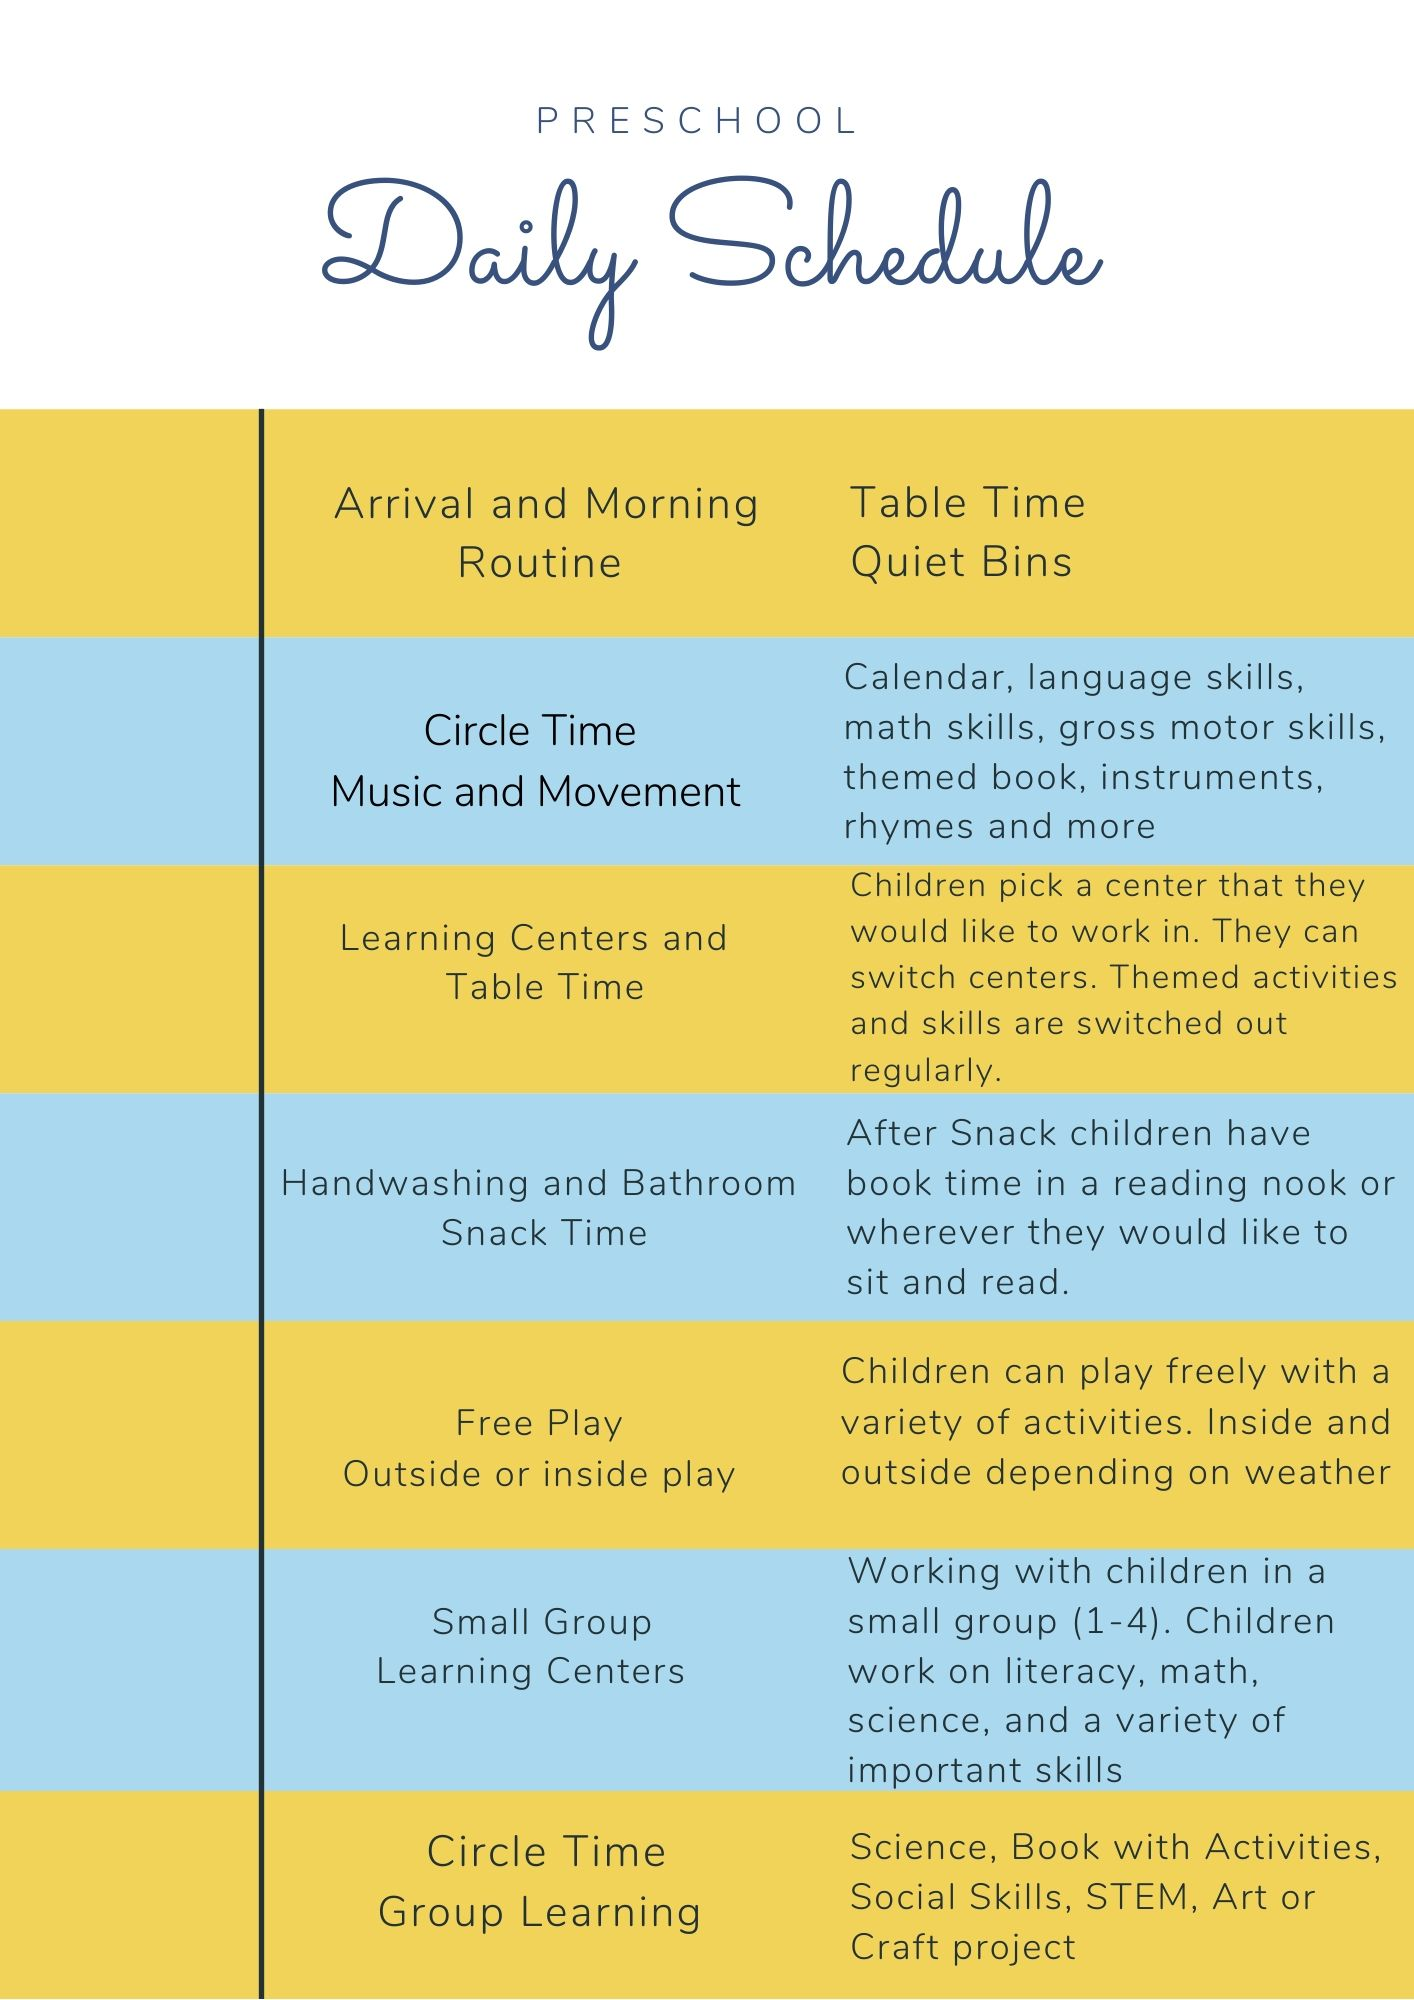 Preschool Daily Schedule Ideas   Natural Beach Living